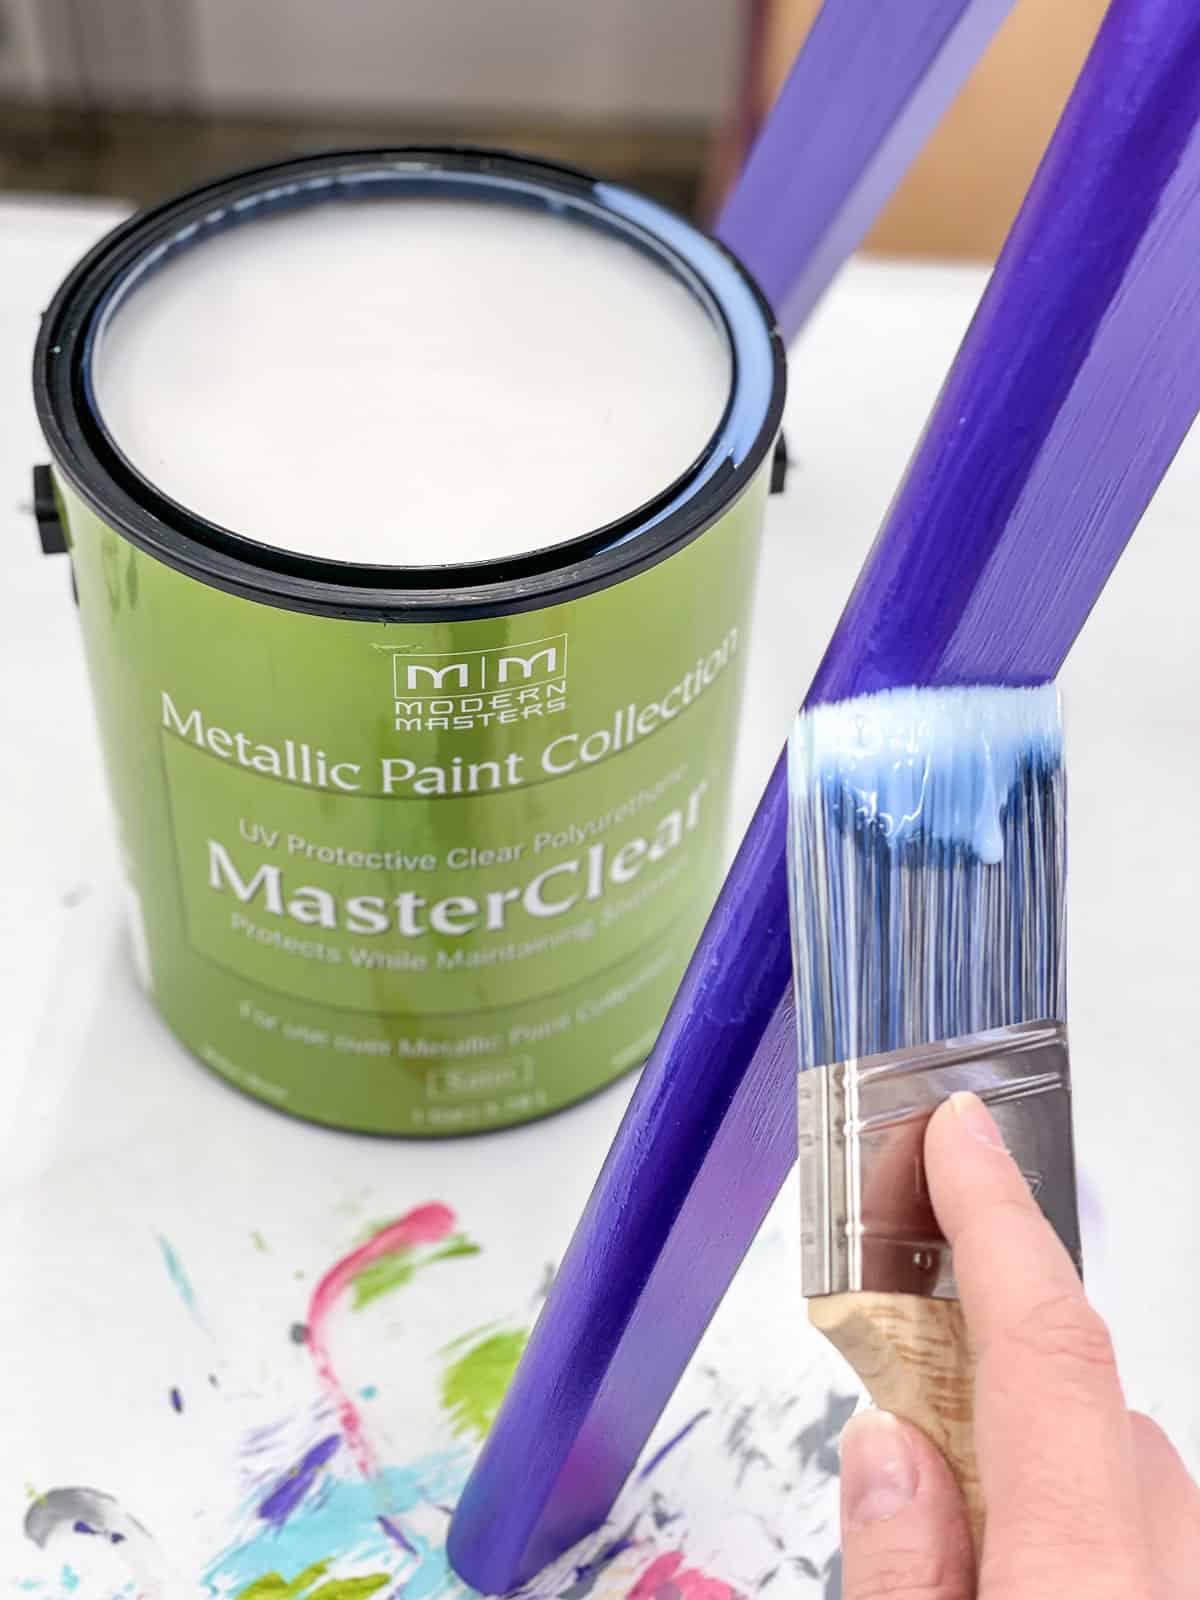 applying Modern Masters MasterClear top coat to purple metallic paint on chair leg